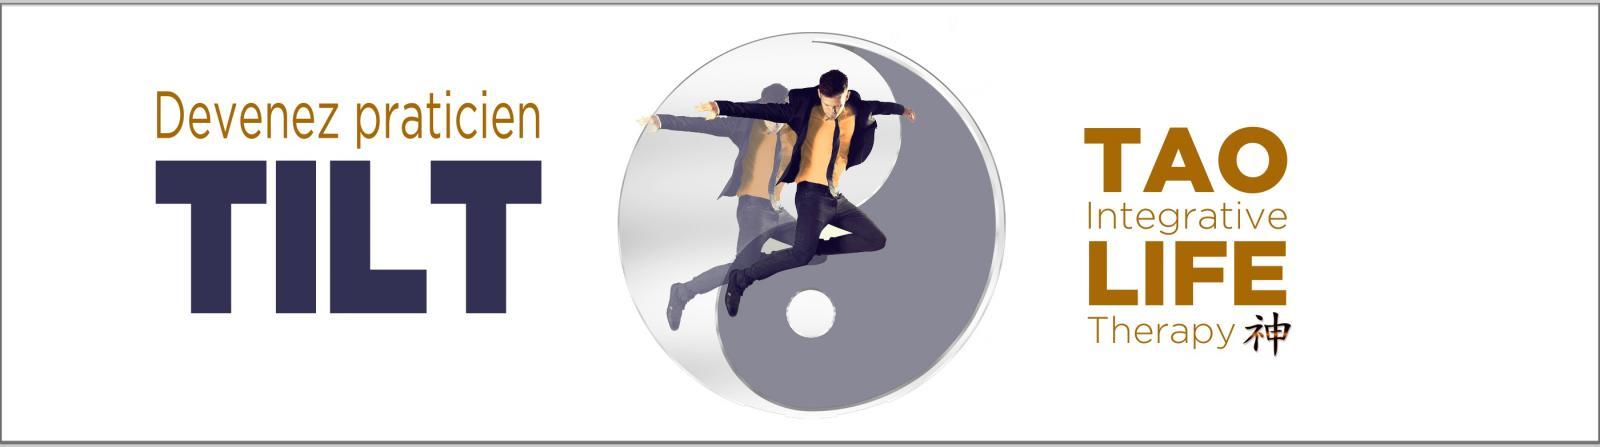 Formations professionnelles TILT Fabien malgrand Tao Integrative Life Therapy